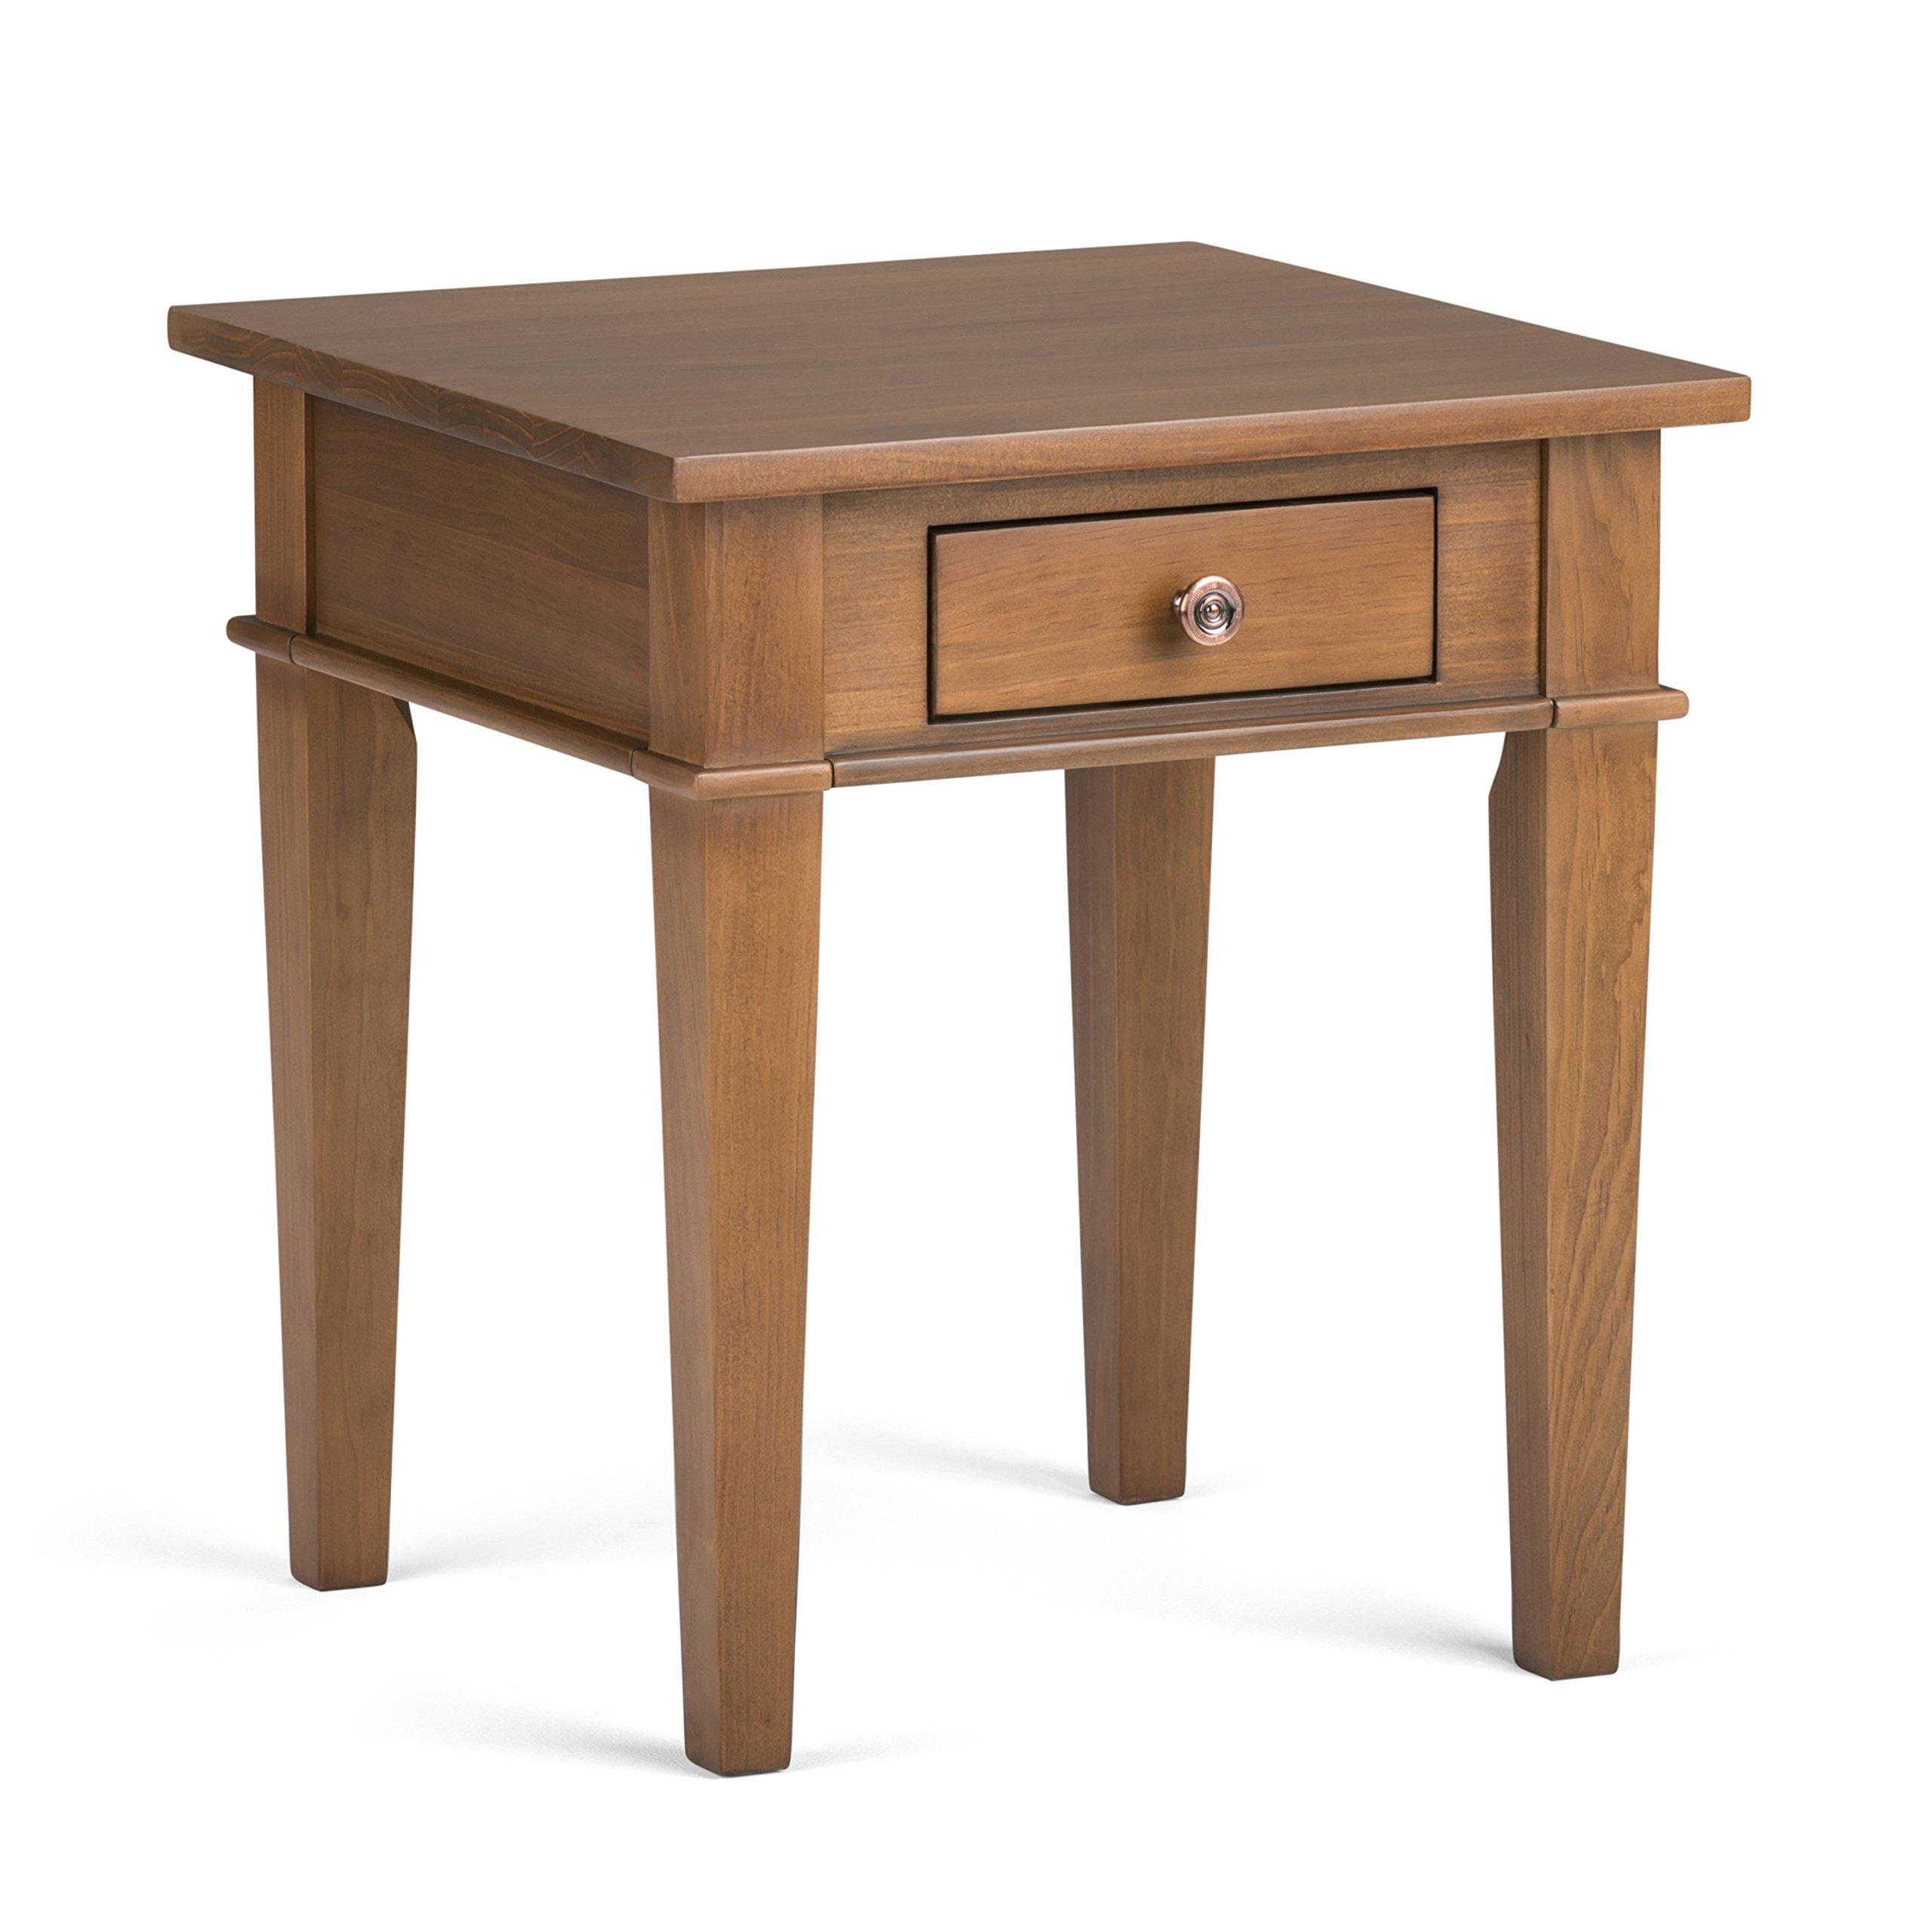 Simpli Home Carlton Solid Wood End Side Table, Medium Saddle Brown